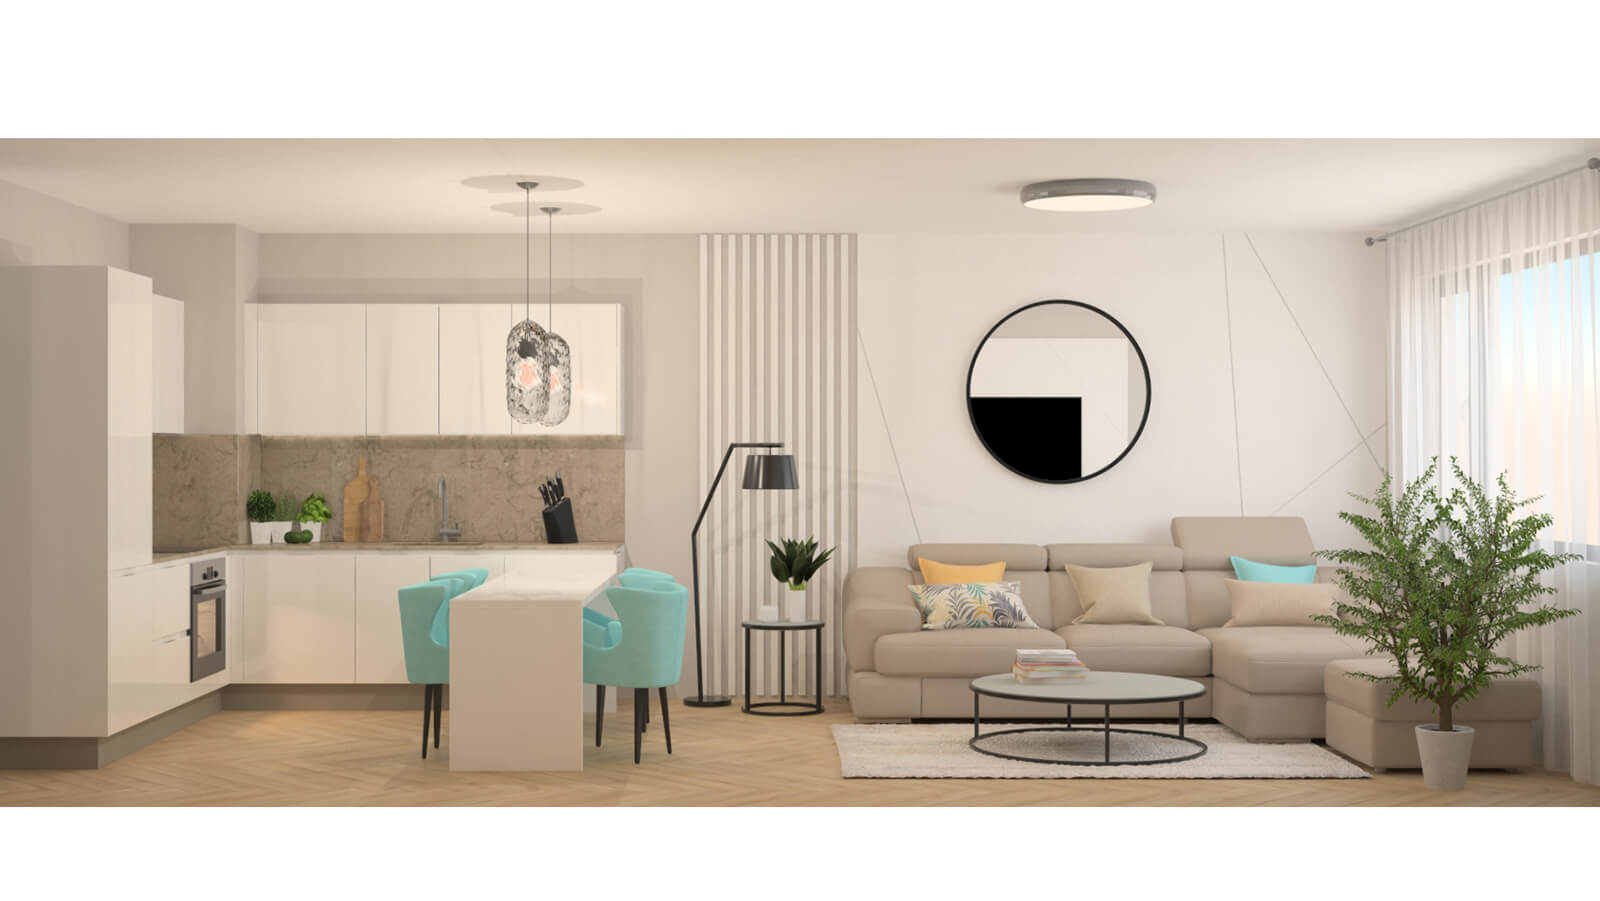 interioren proekt dizain Trend